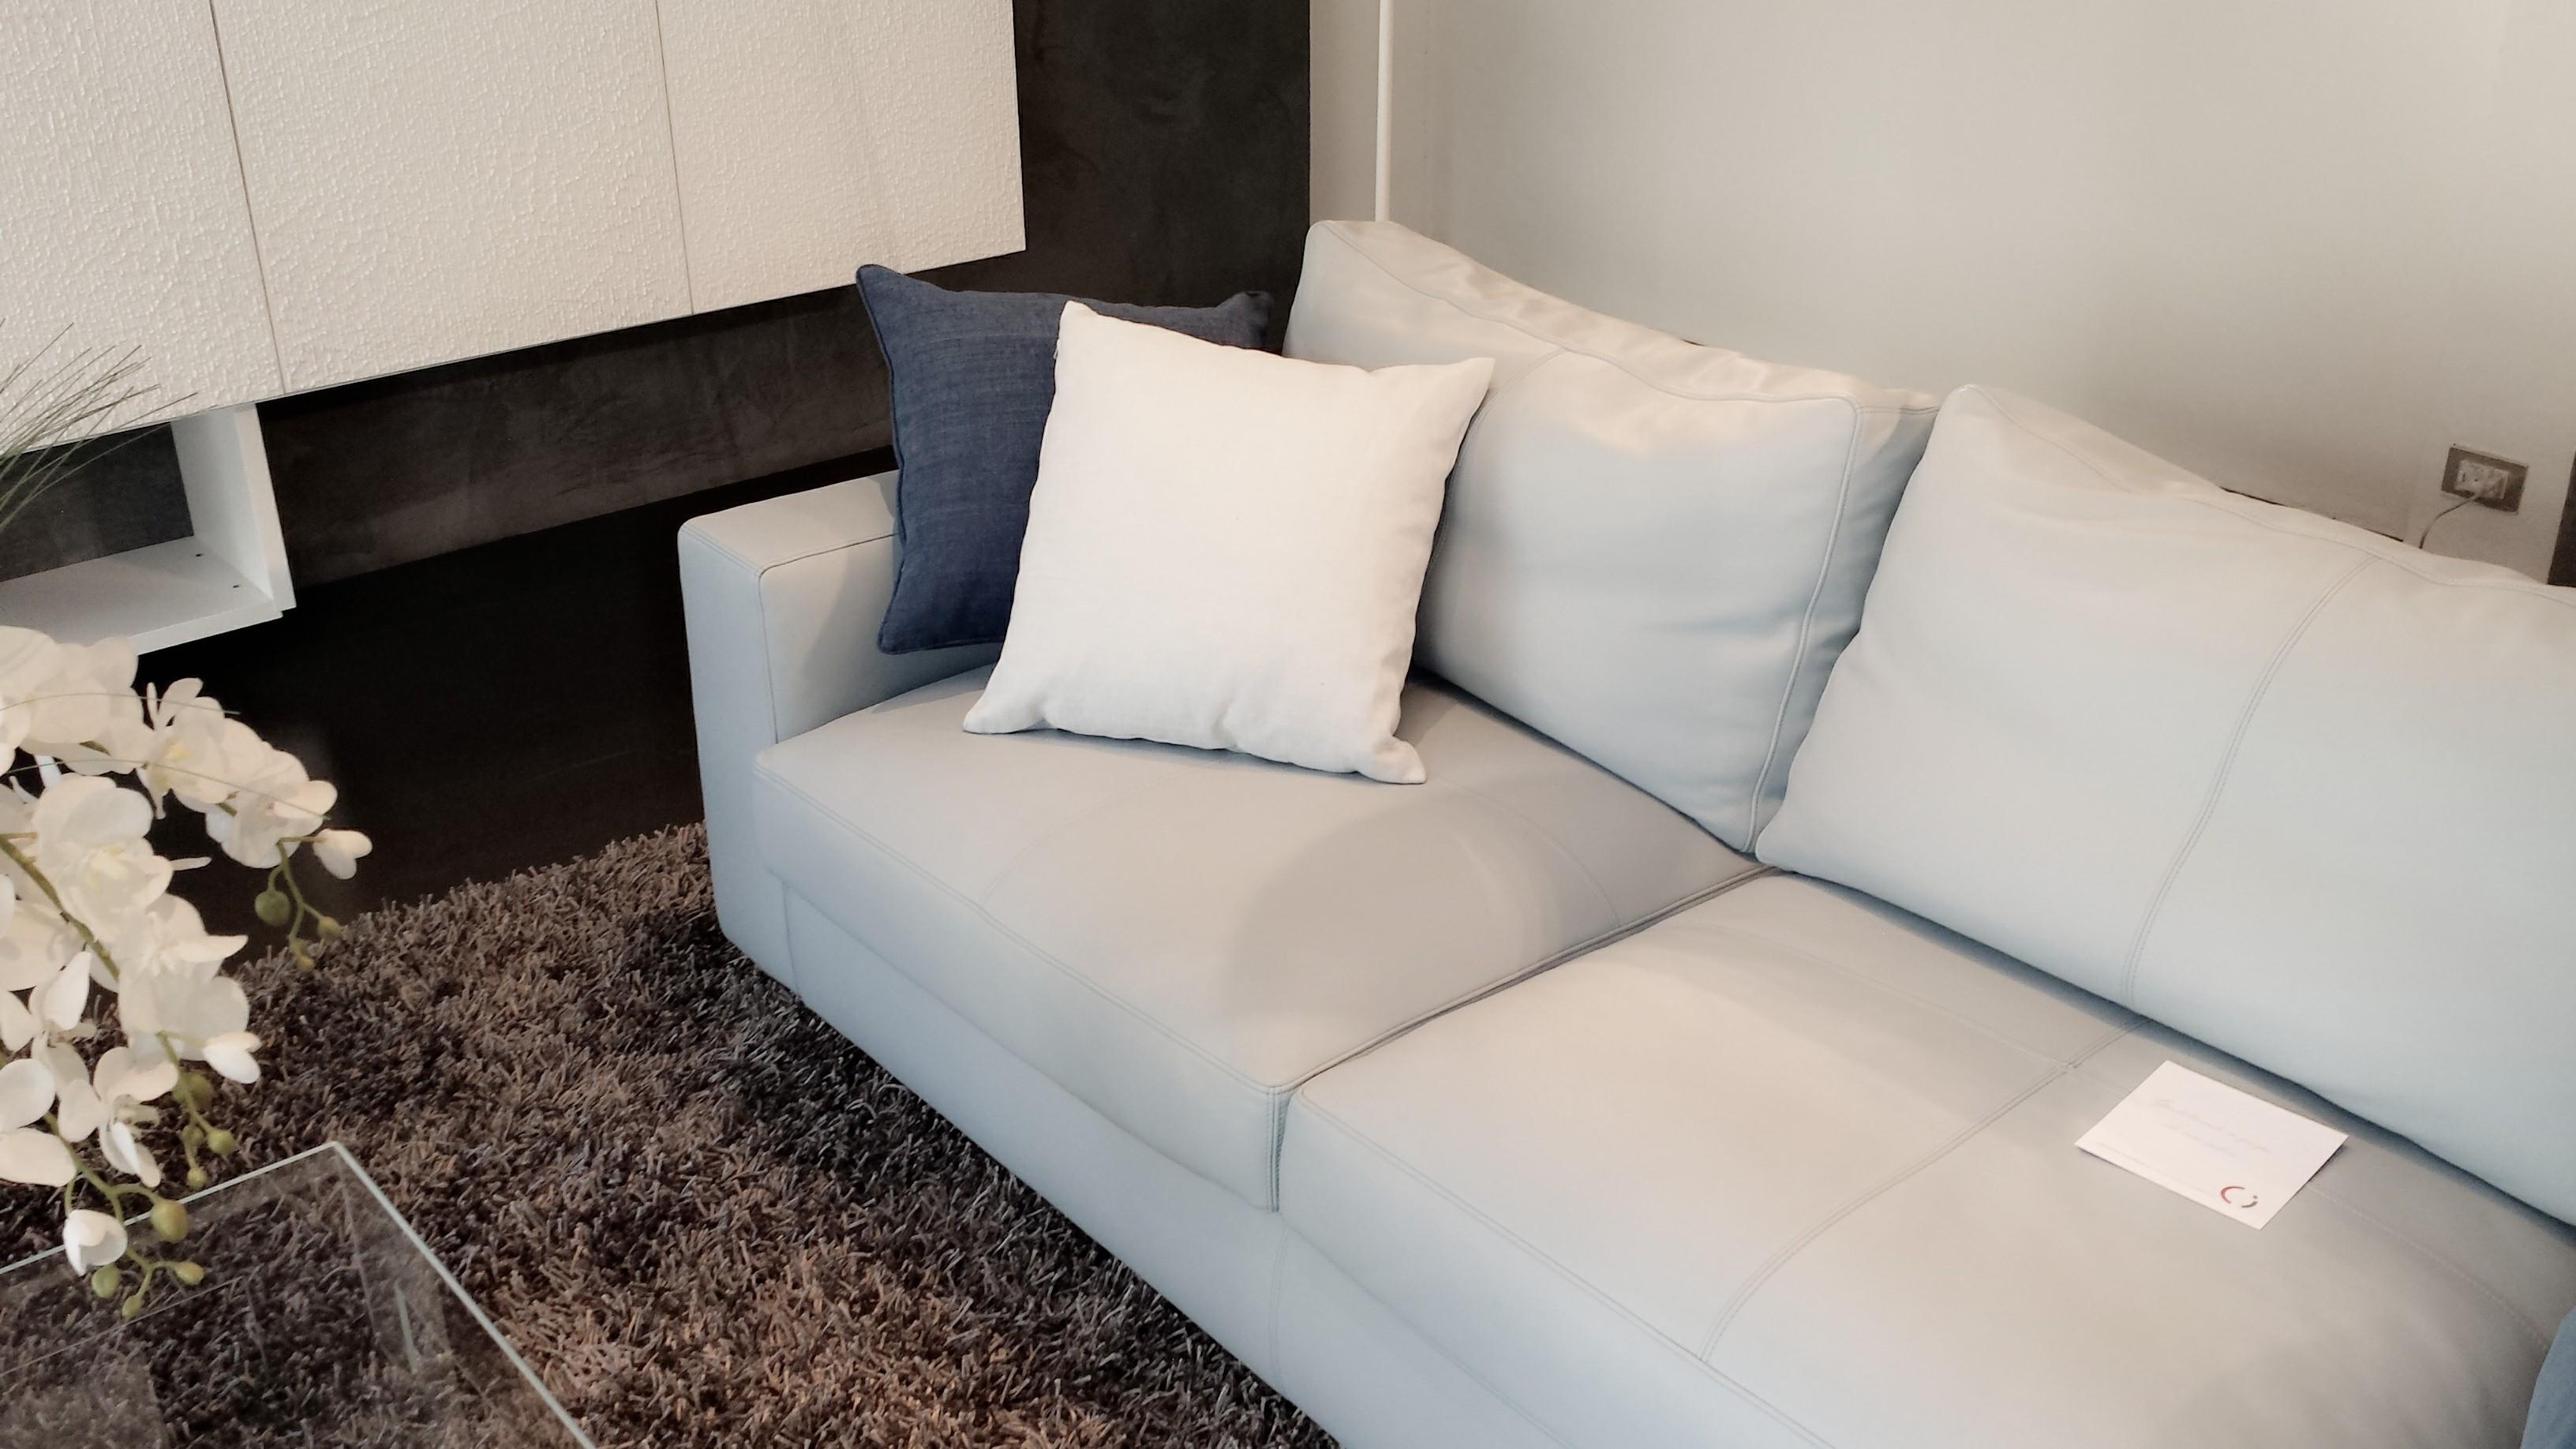 Offertissima poltrona frau divano divani a prezzi scontati for Divani frau outlet